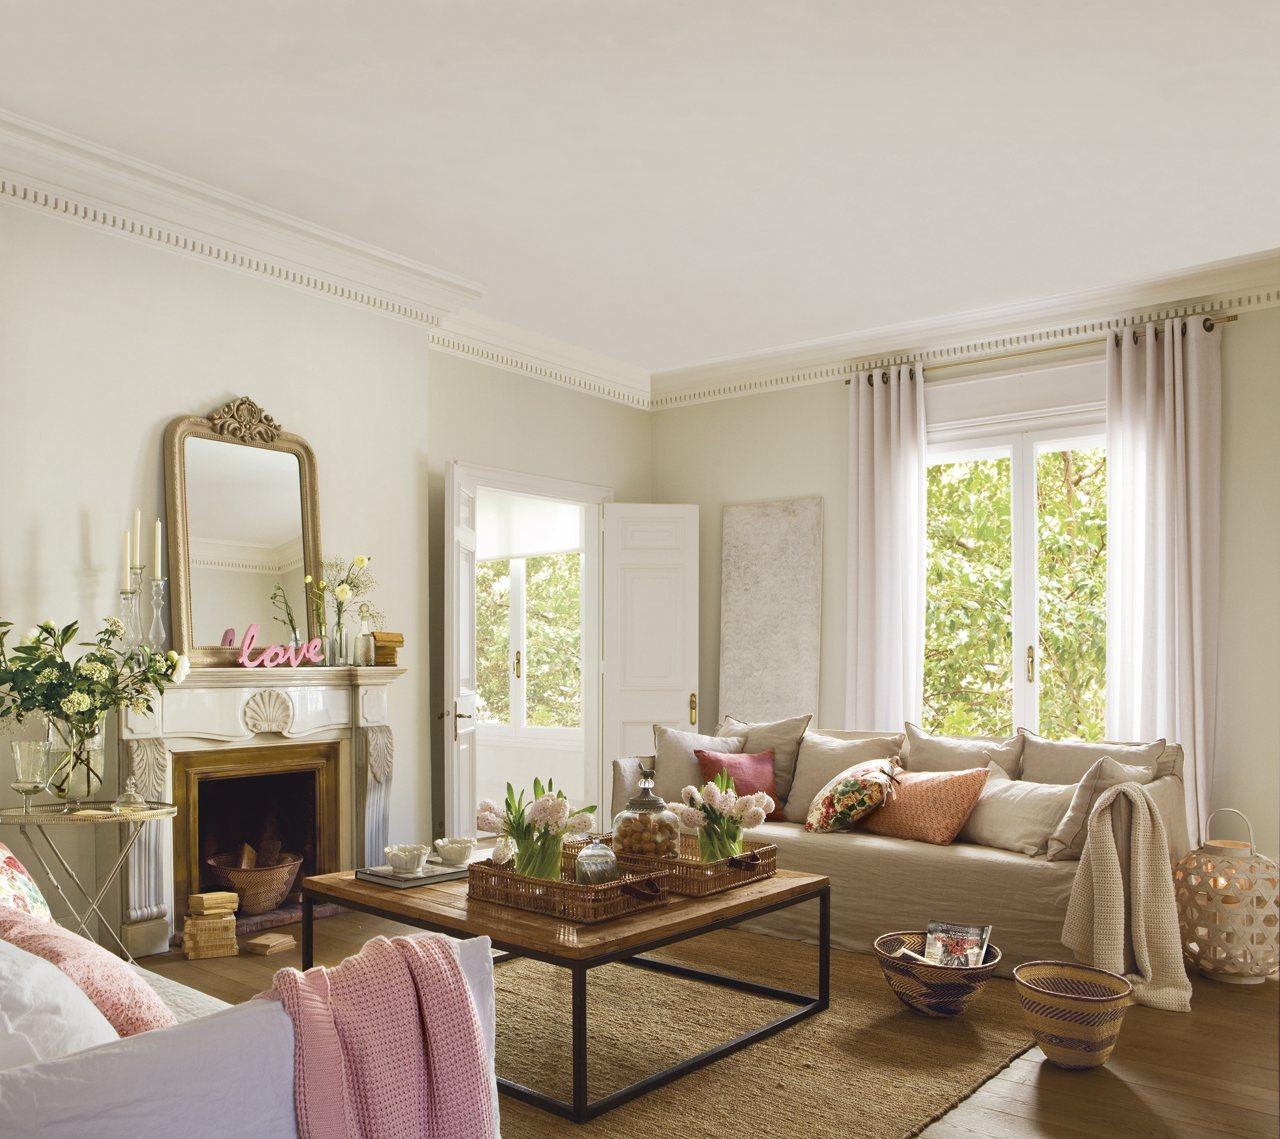 Una preciosa vivienda de estilo cl sico renovado etxekodeco for Molduras para chimeneas